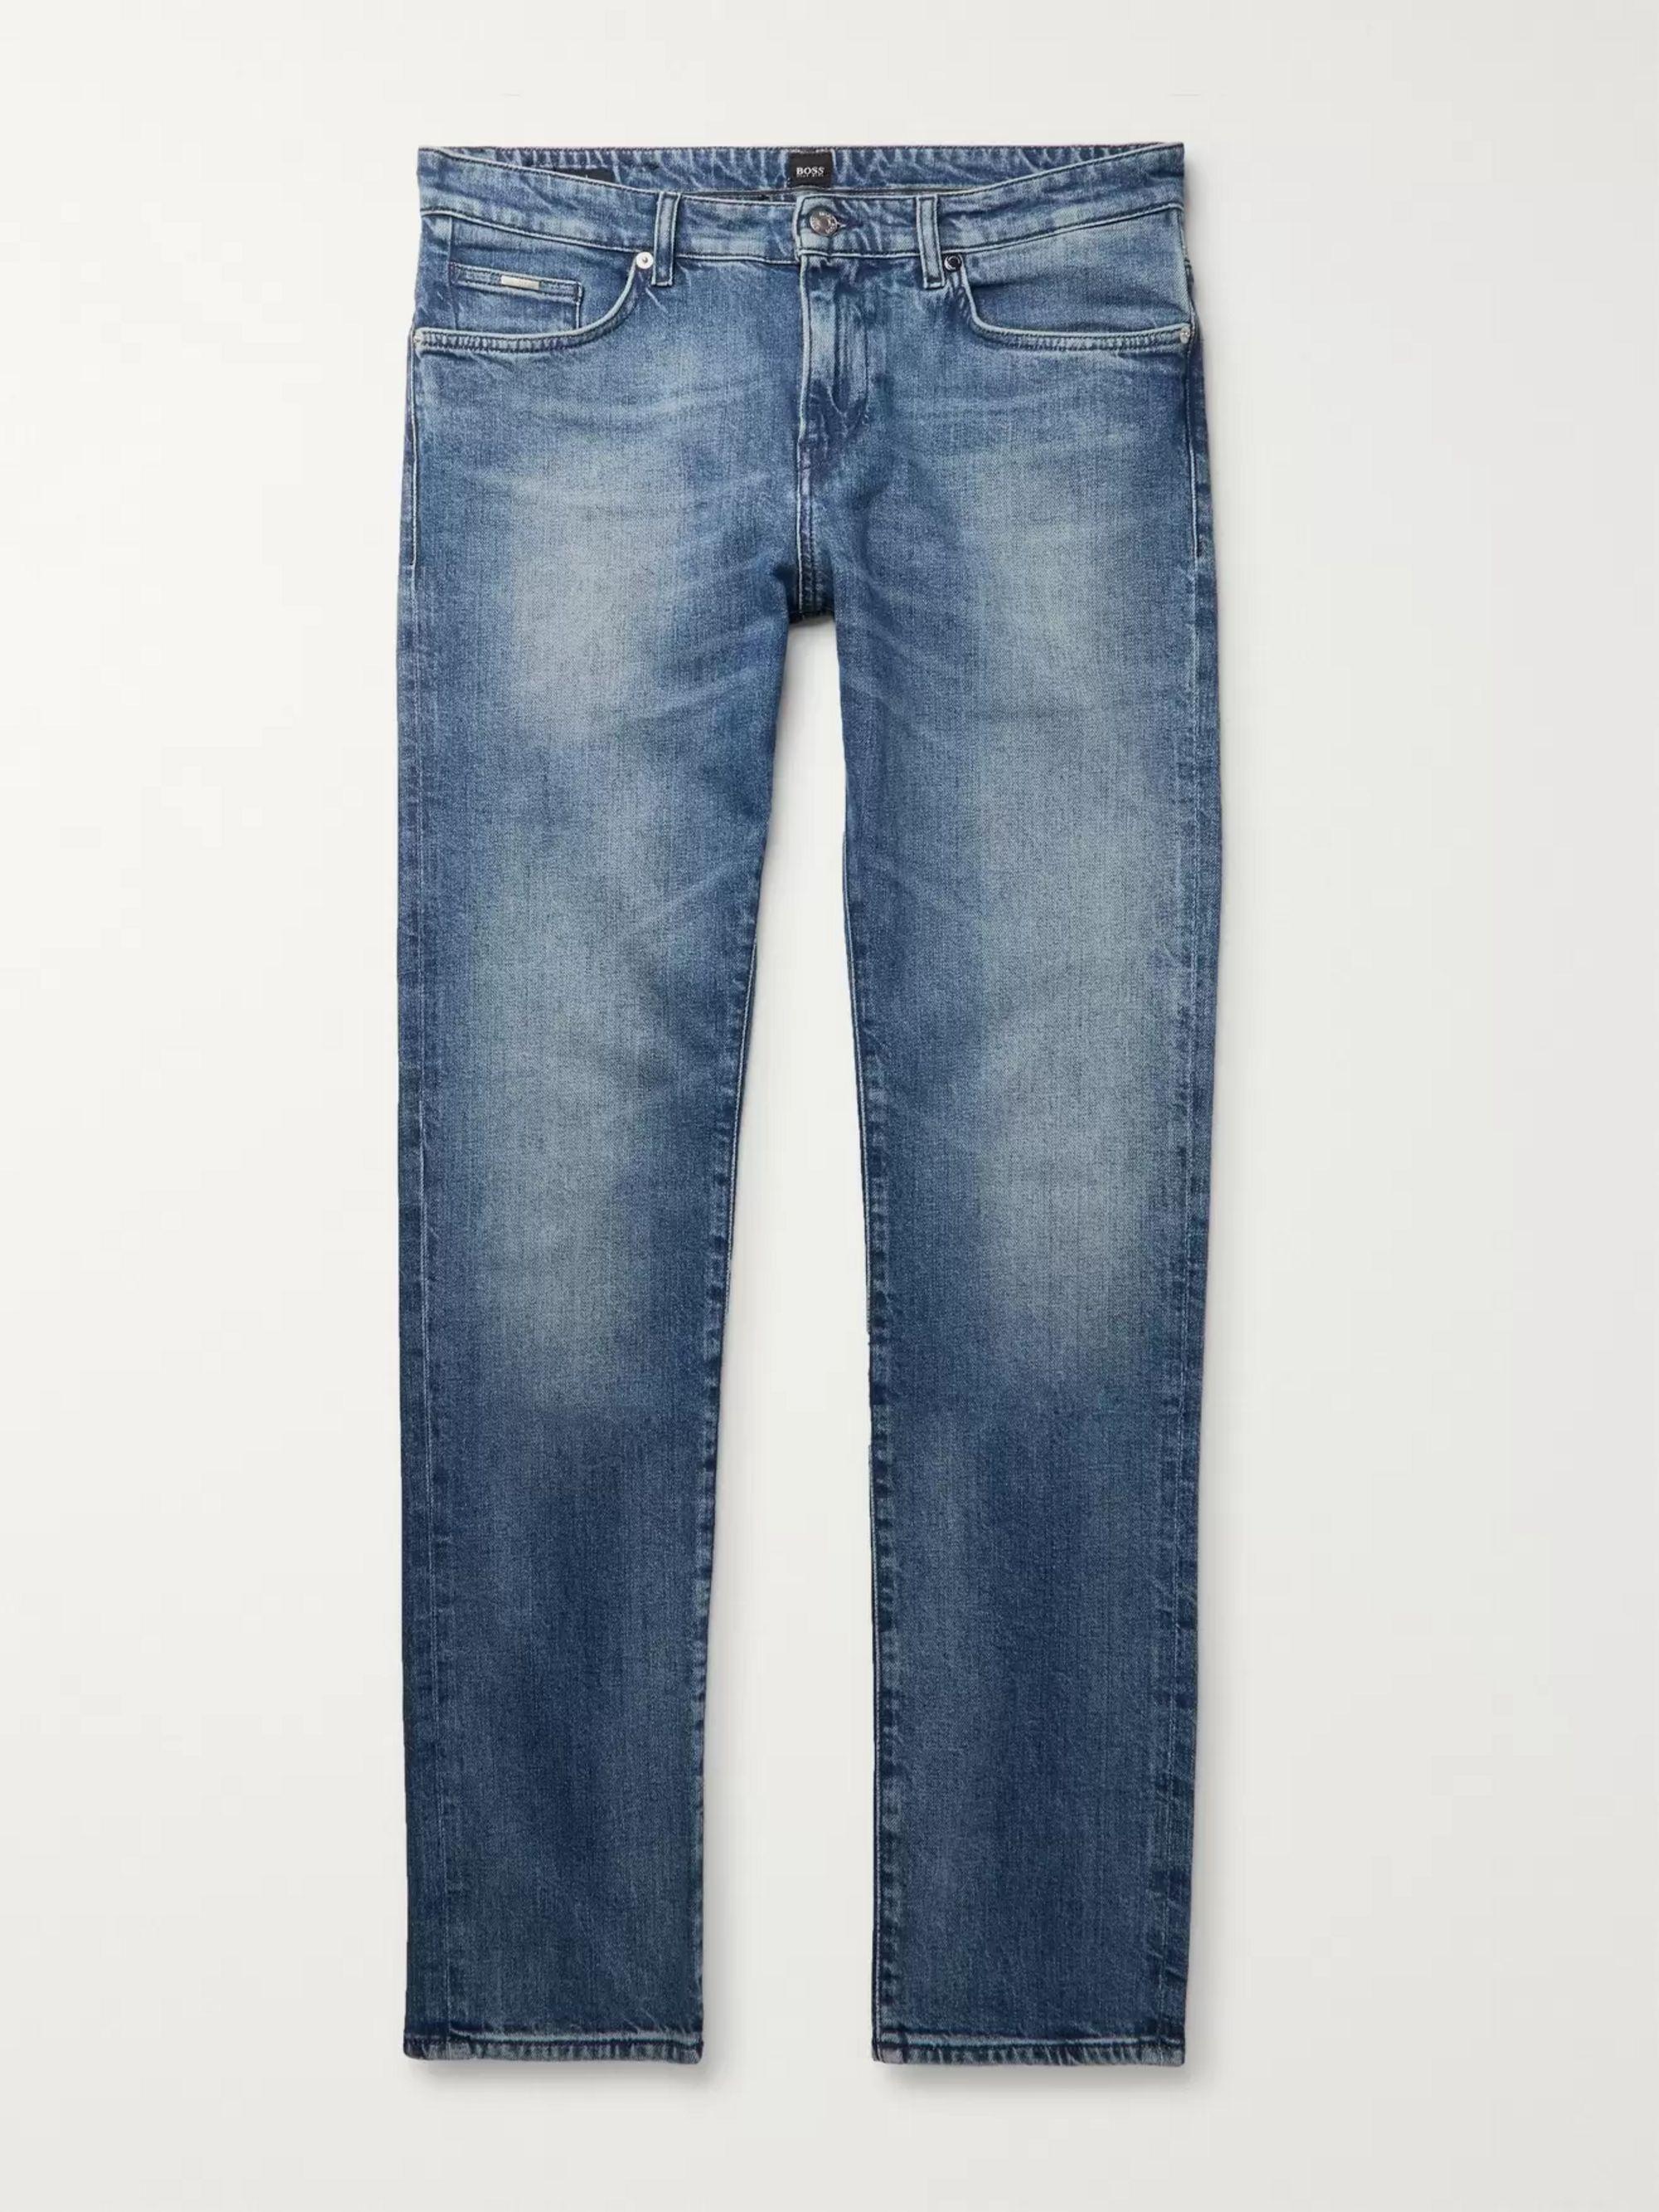 HUGO BOSS Slim-Fit Denim Jeans